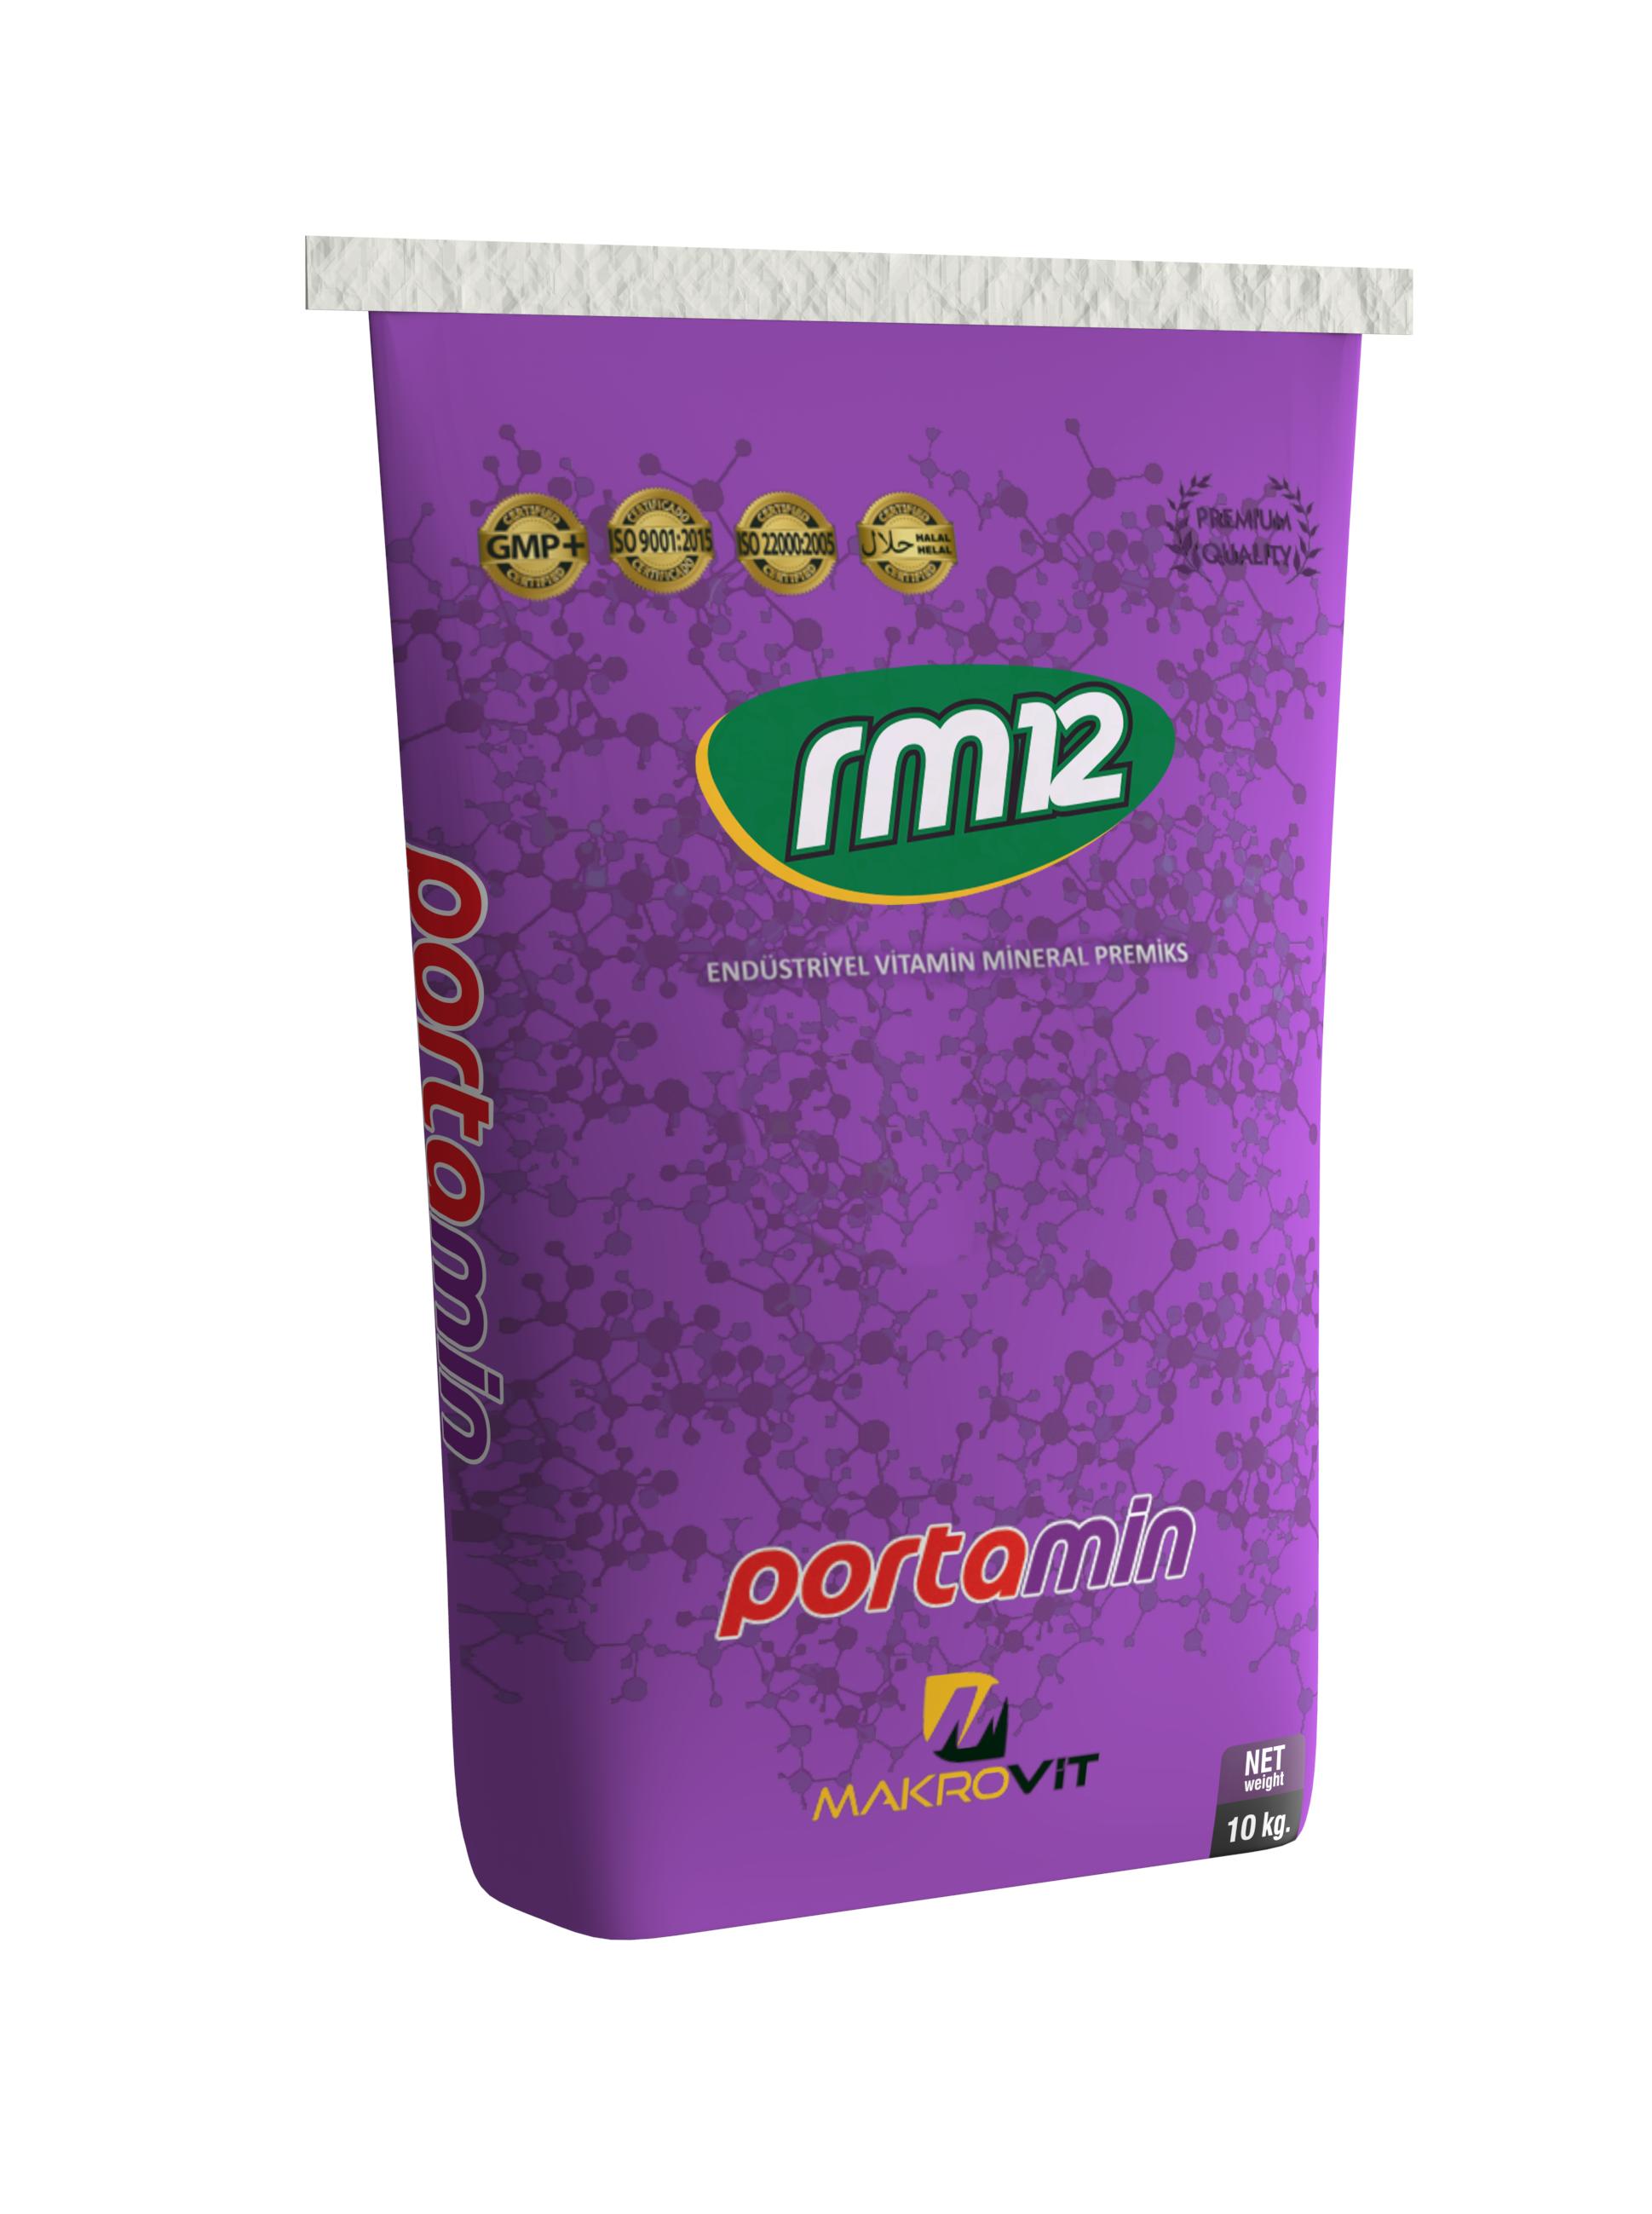 Portamin Rm12